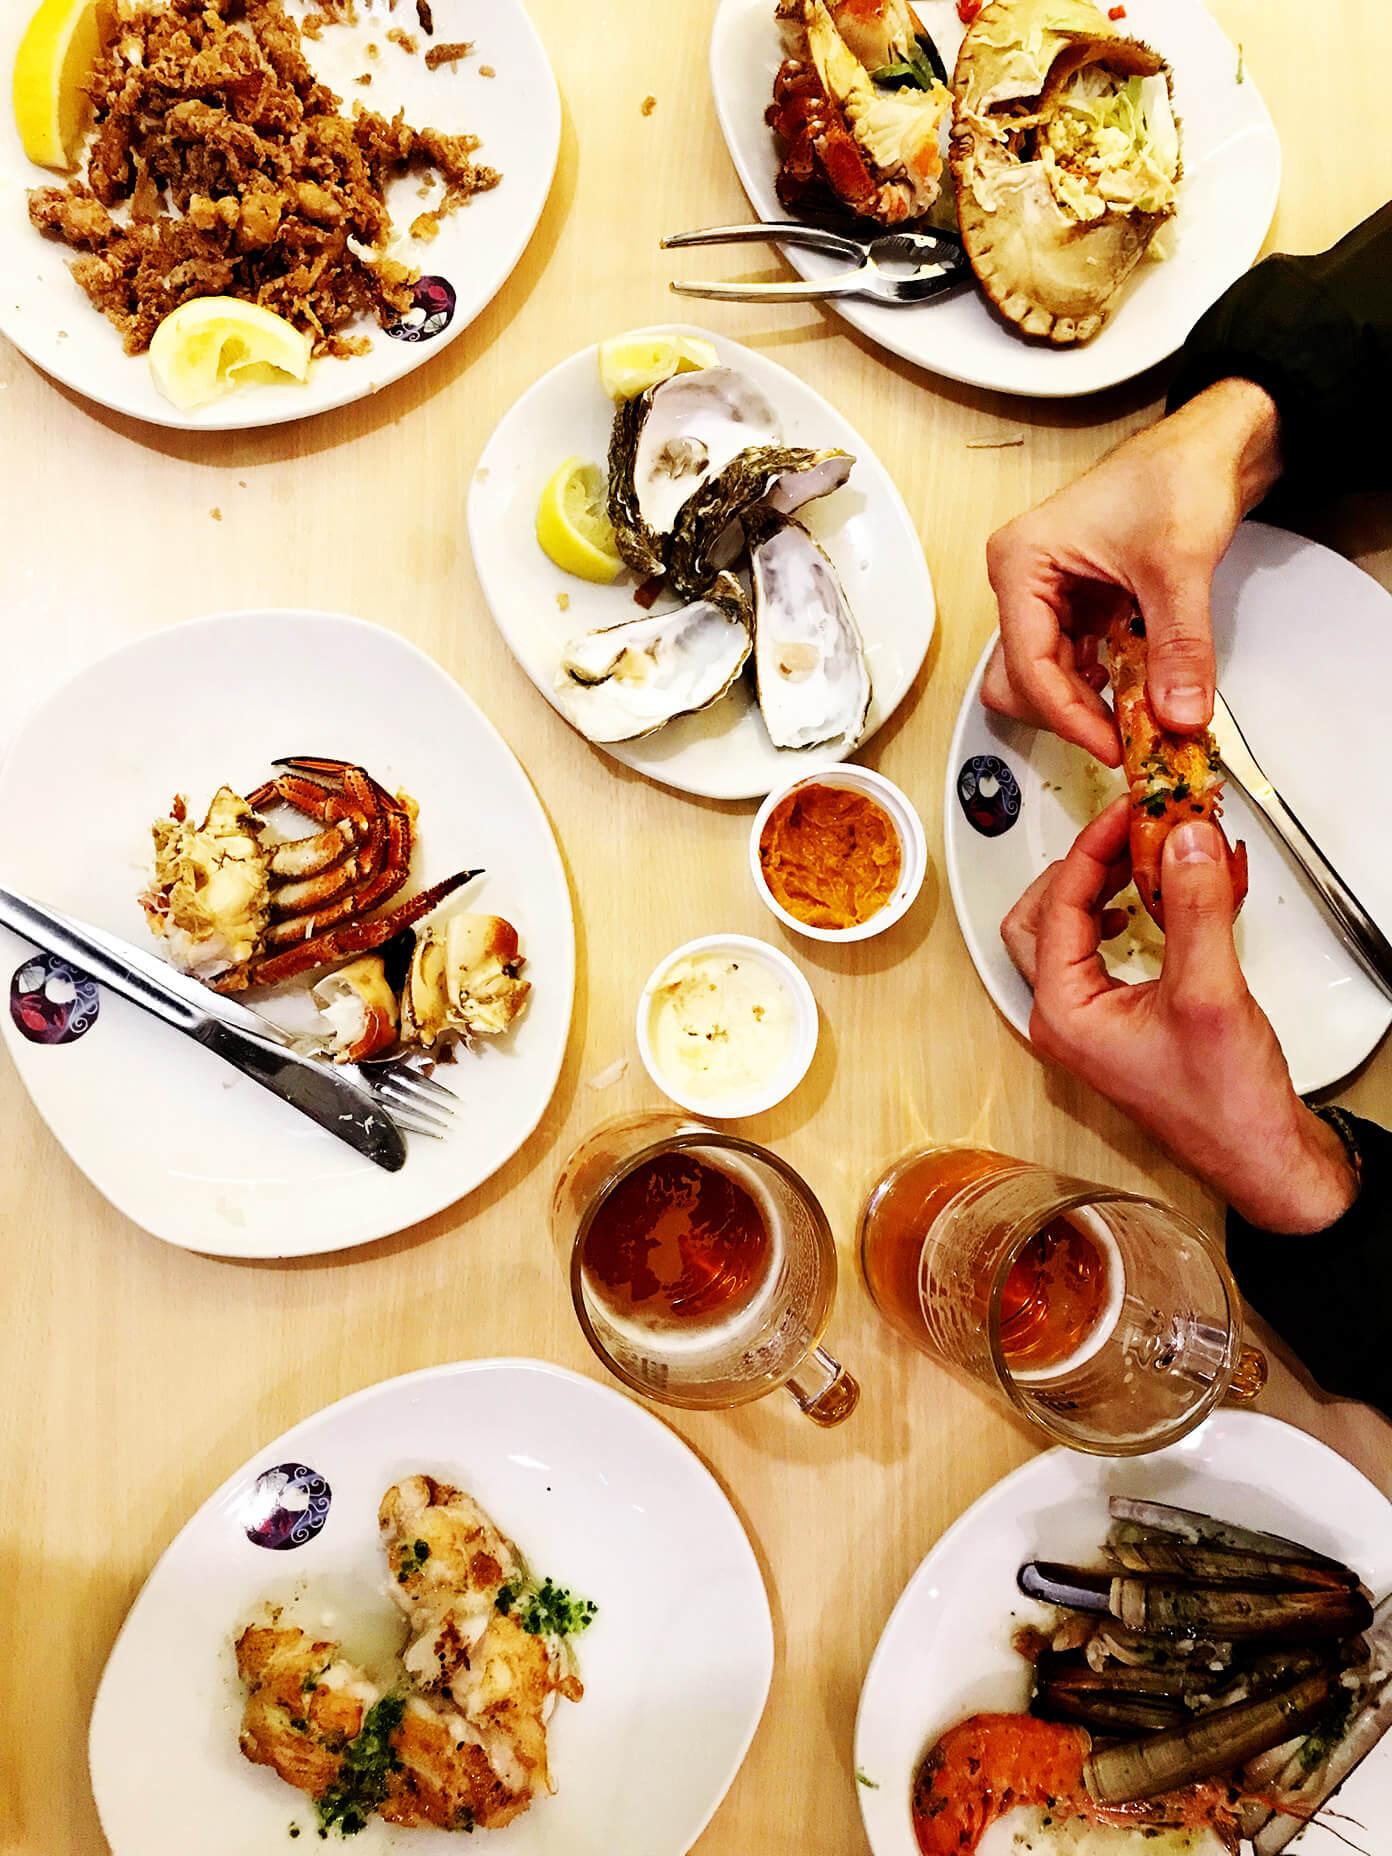 La Paradeta seafood restaurant   Gimme Some Barcelona Travel Guide